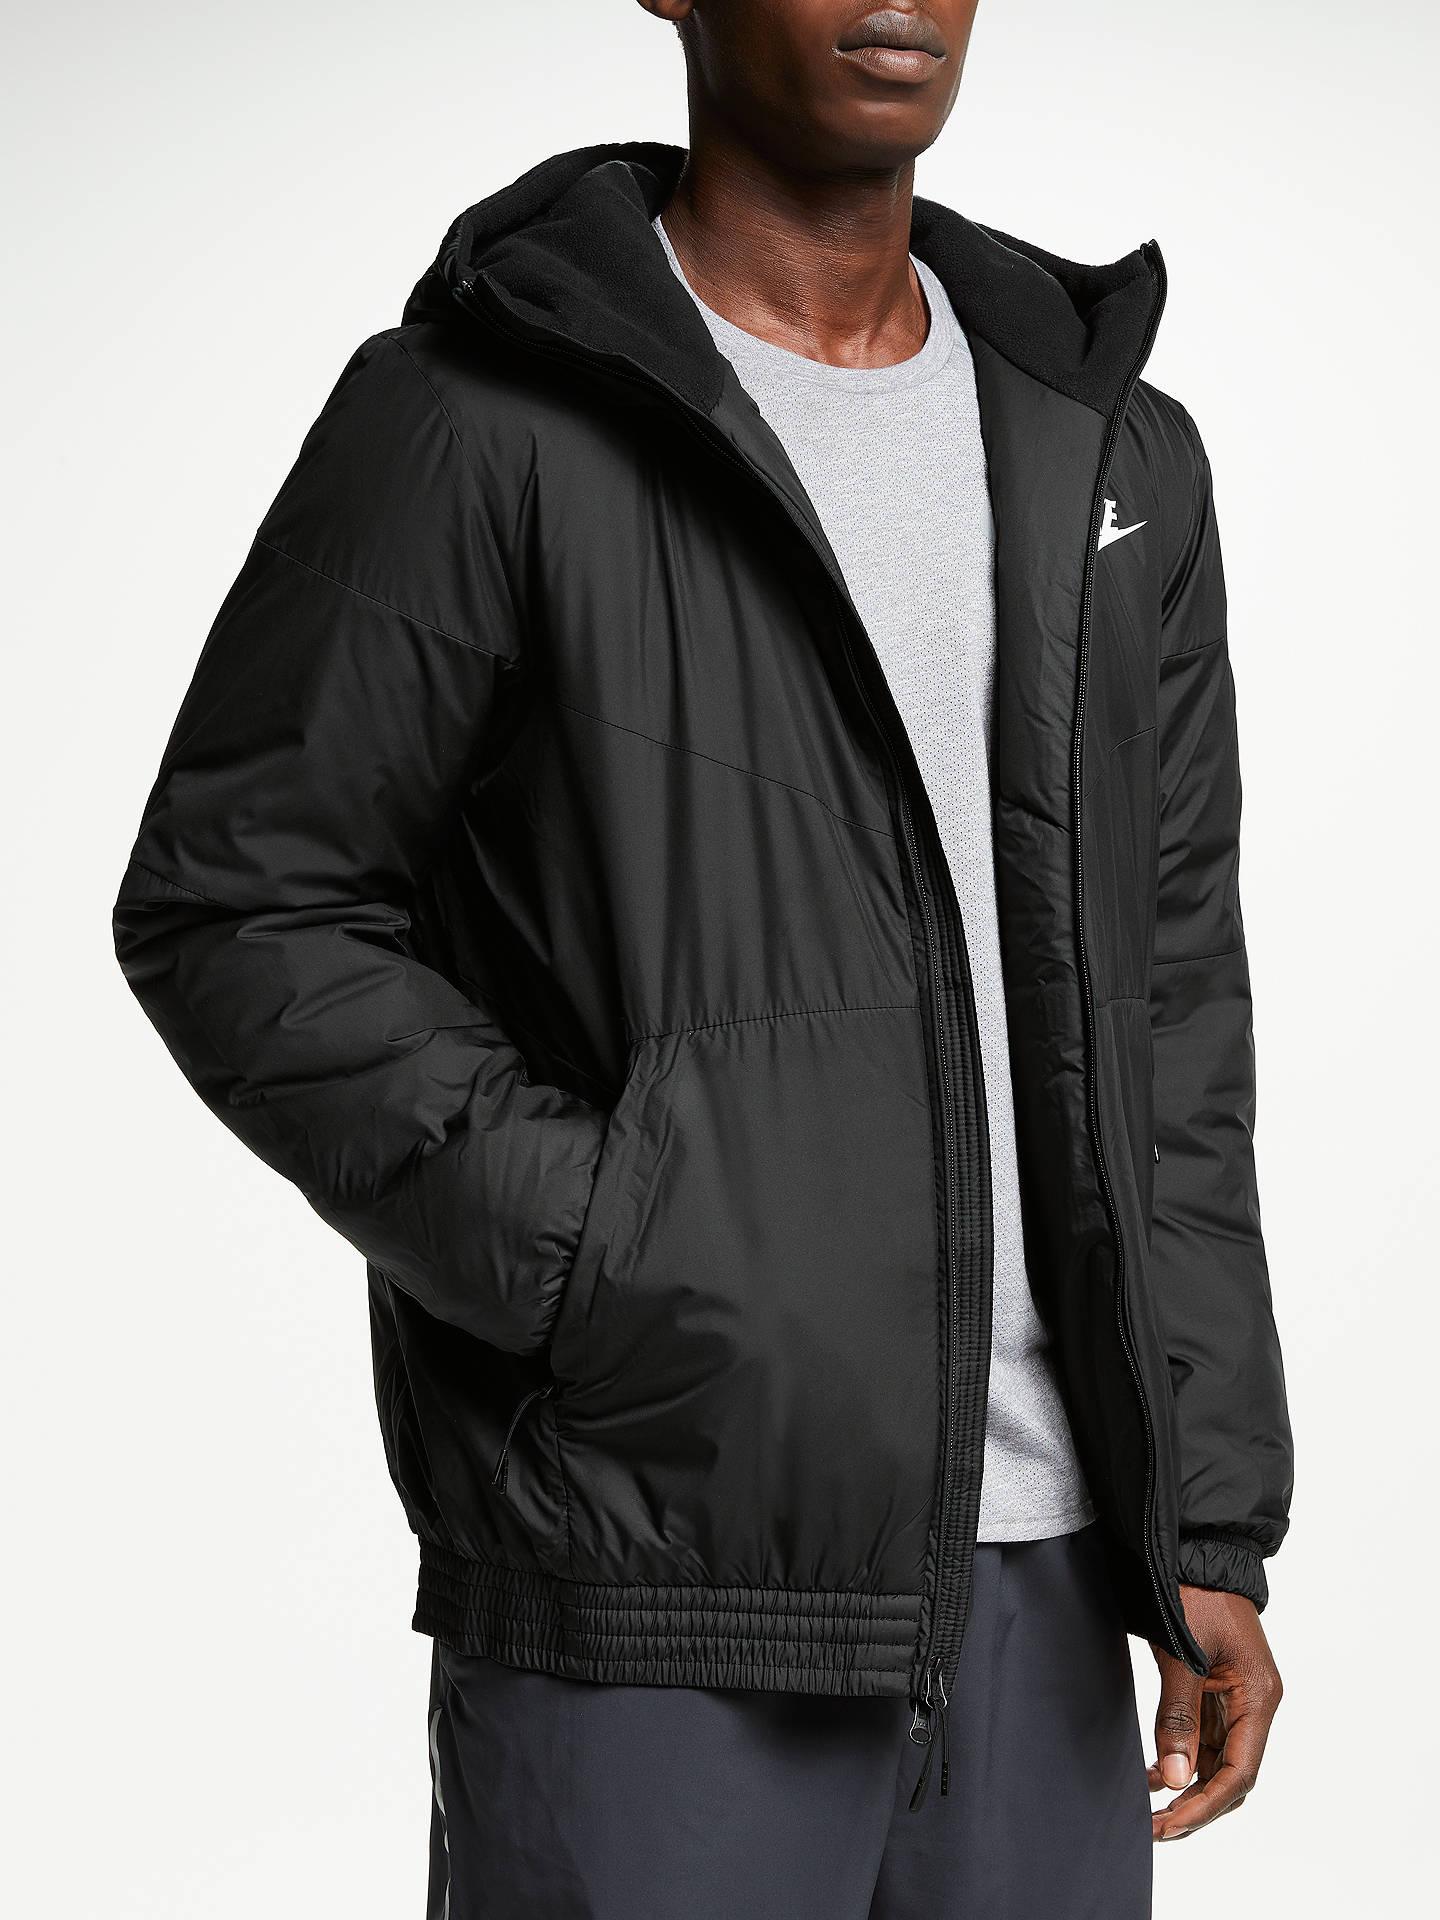 champán colisión Maldito  Nike Synthetic Fill Jacket, Black at John Lewis & Partners